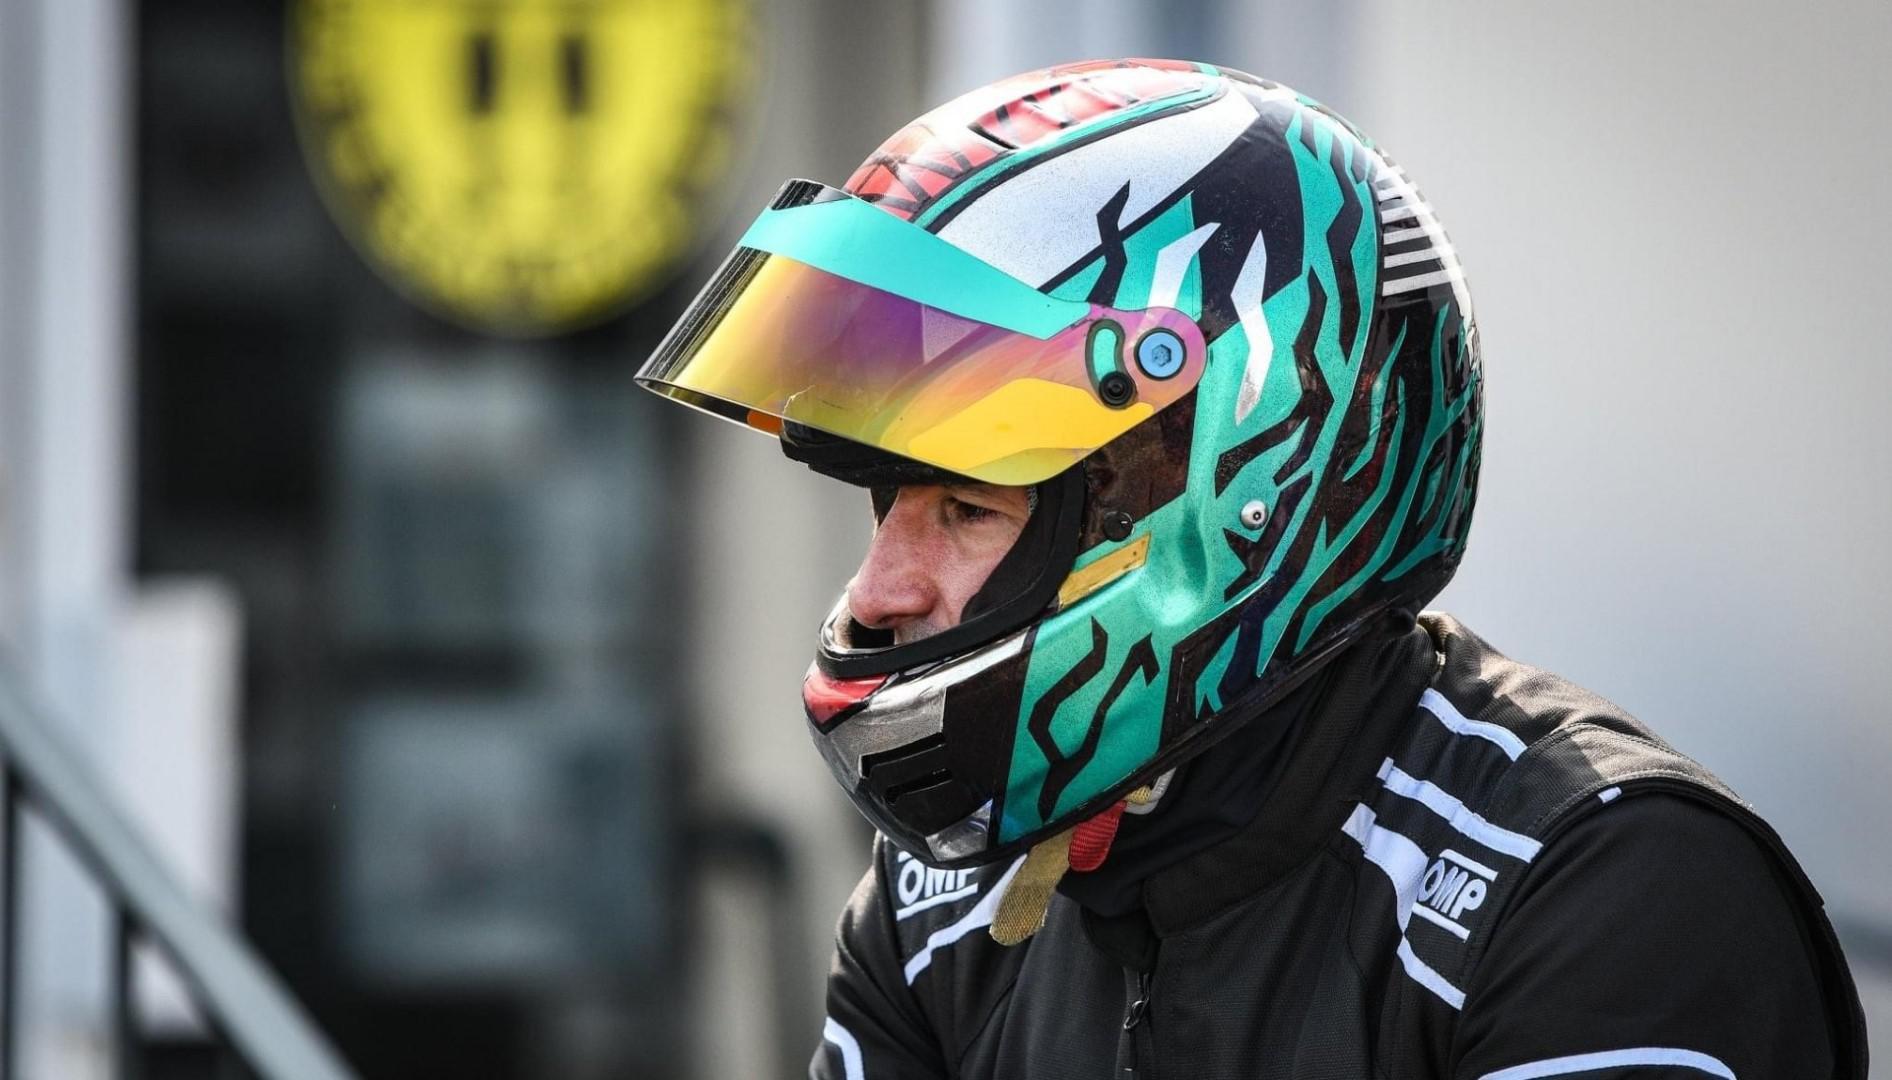 Qui est ce Marocain champion de Karting en Angleterre ?